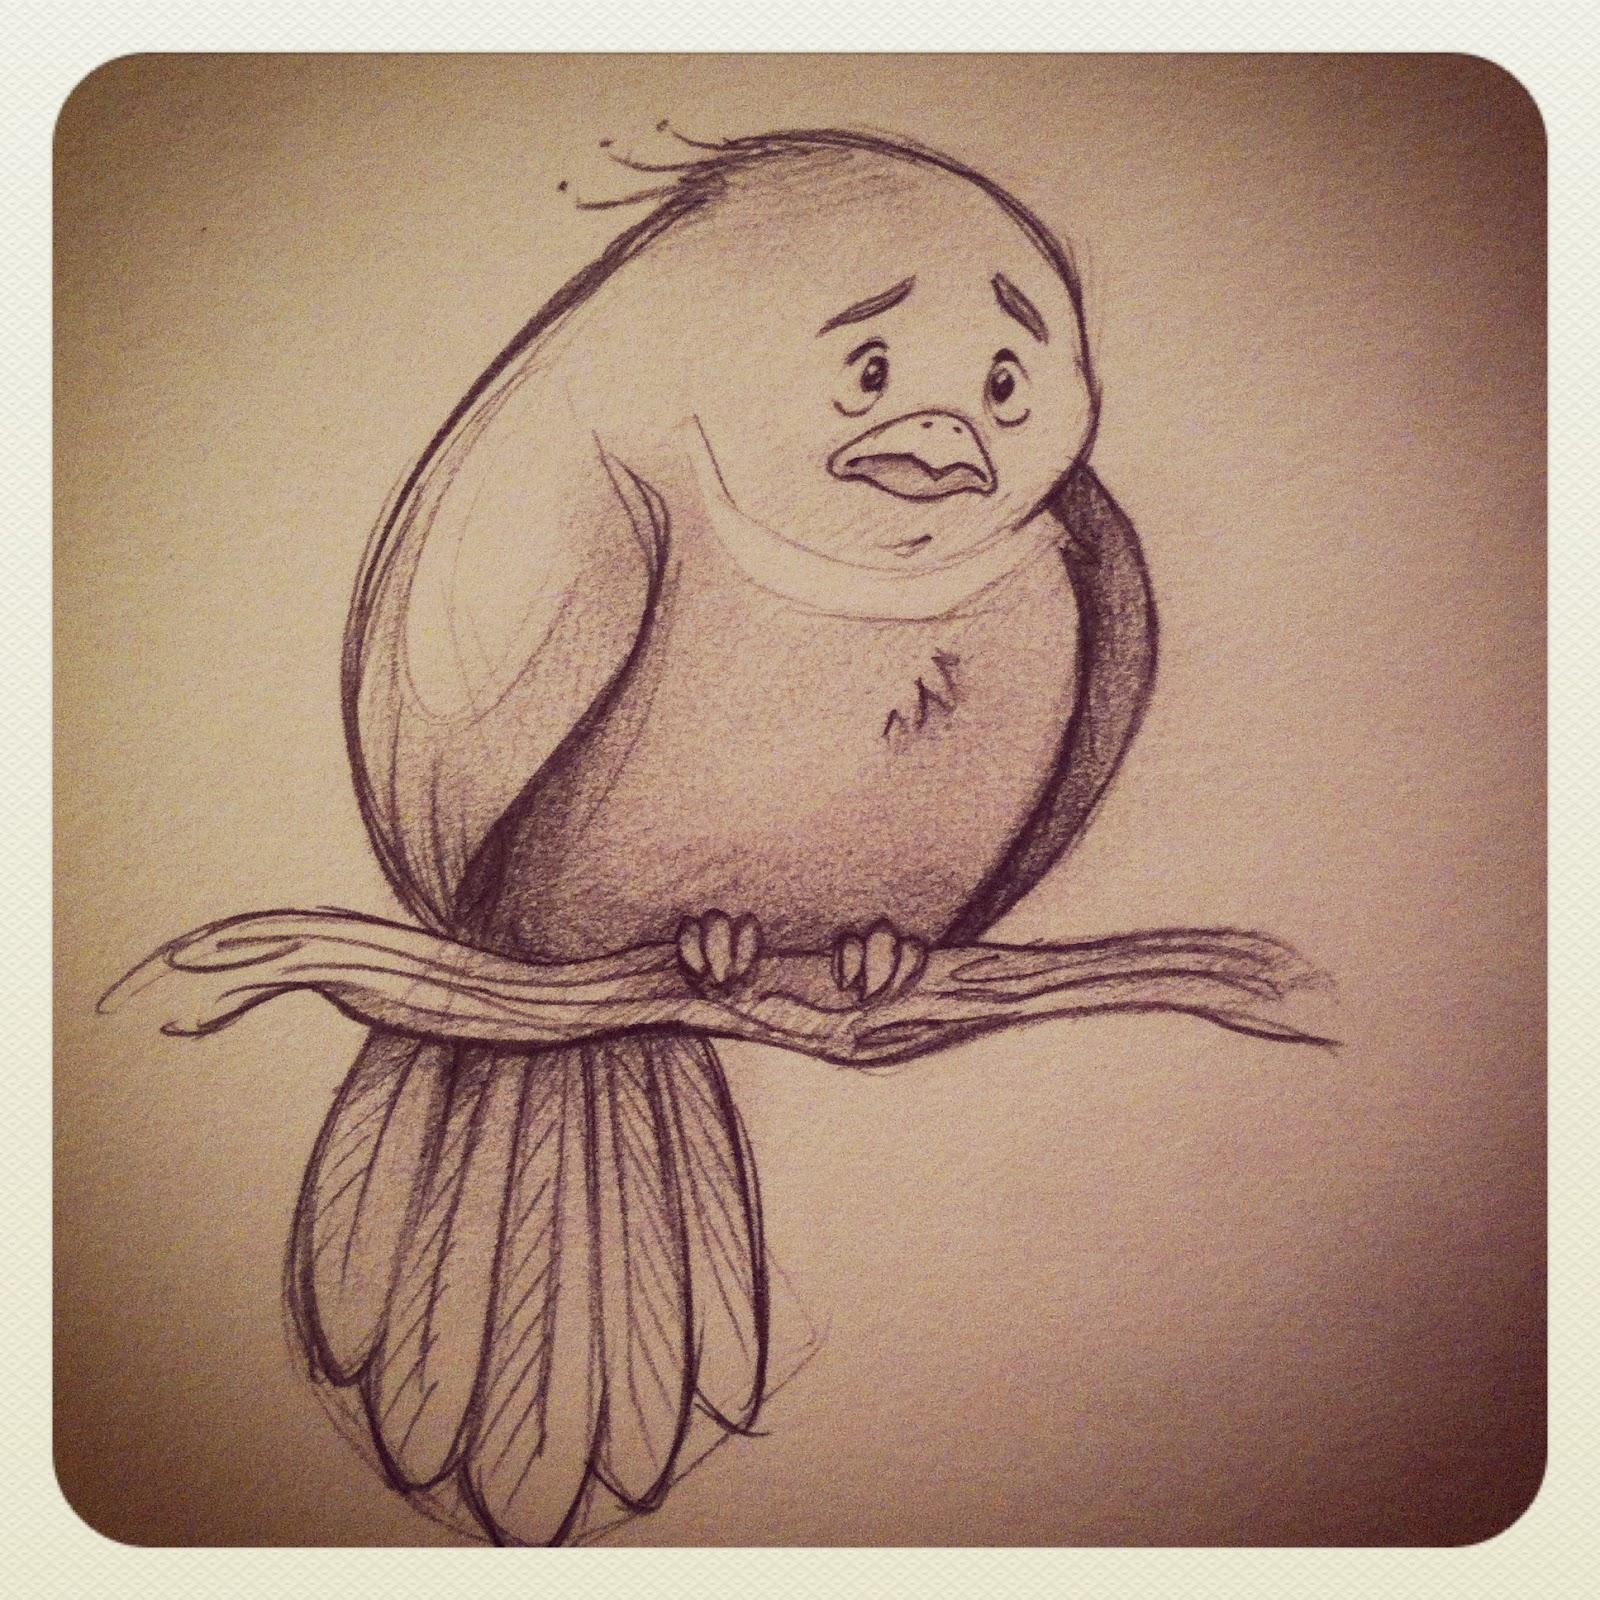 Drawn lonely Friday: Illustration Han Lonely Illustration